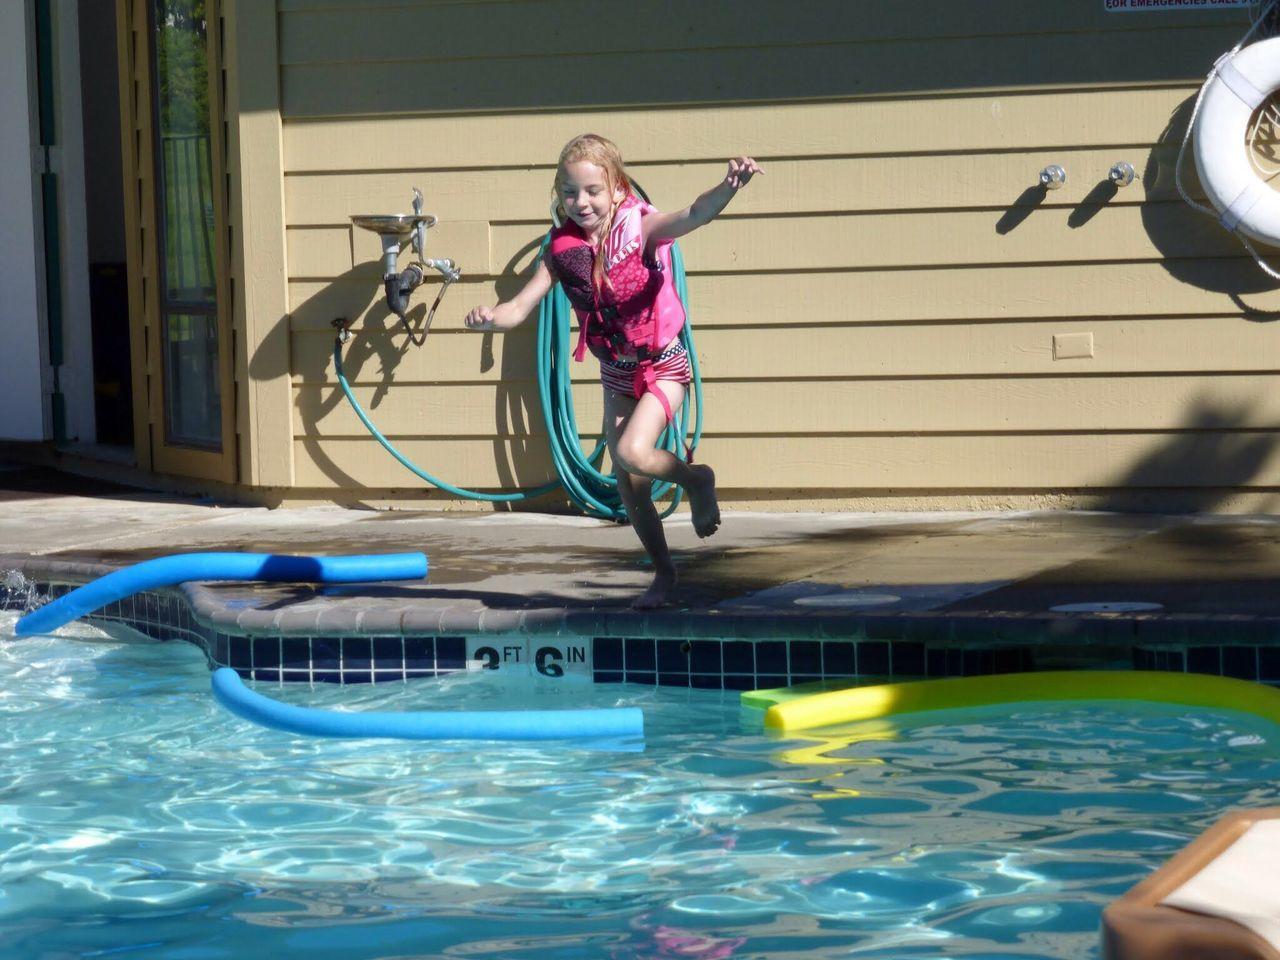 Full length of girl diving into swimming pool